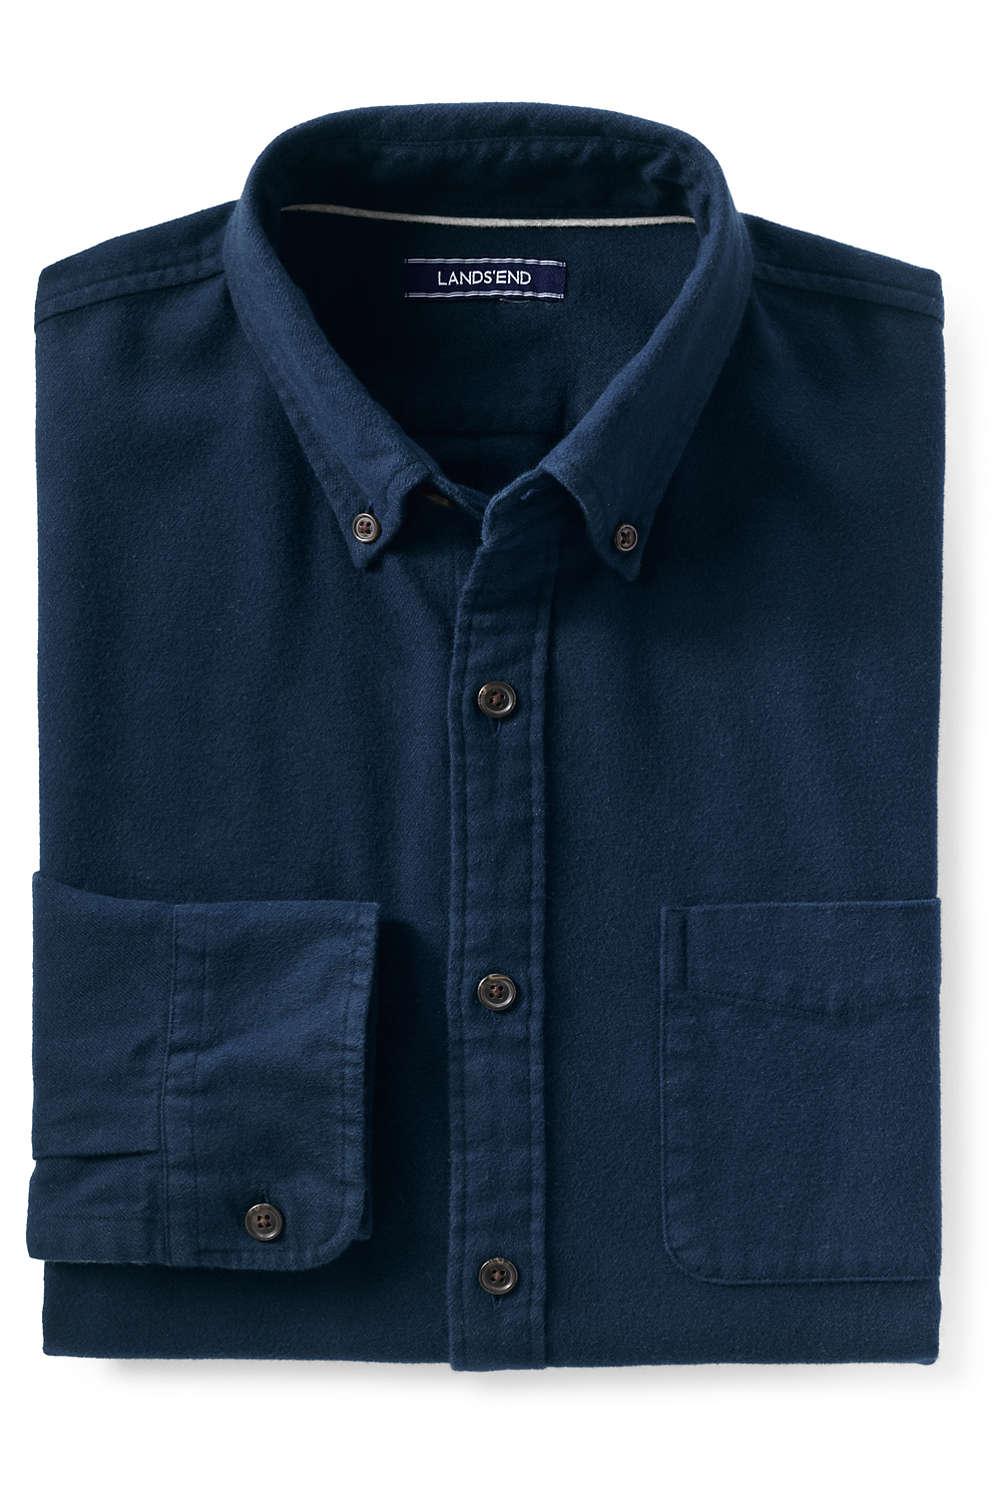 Men S Flagship Flannel Shirt From Lands End